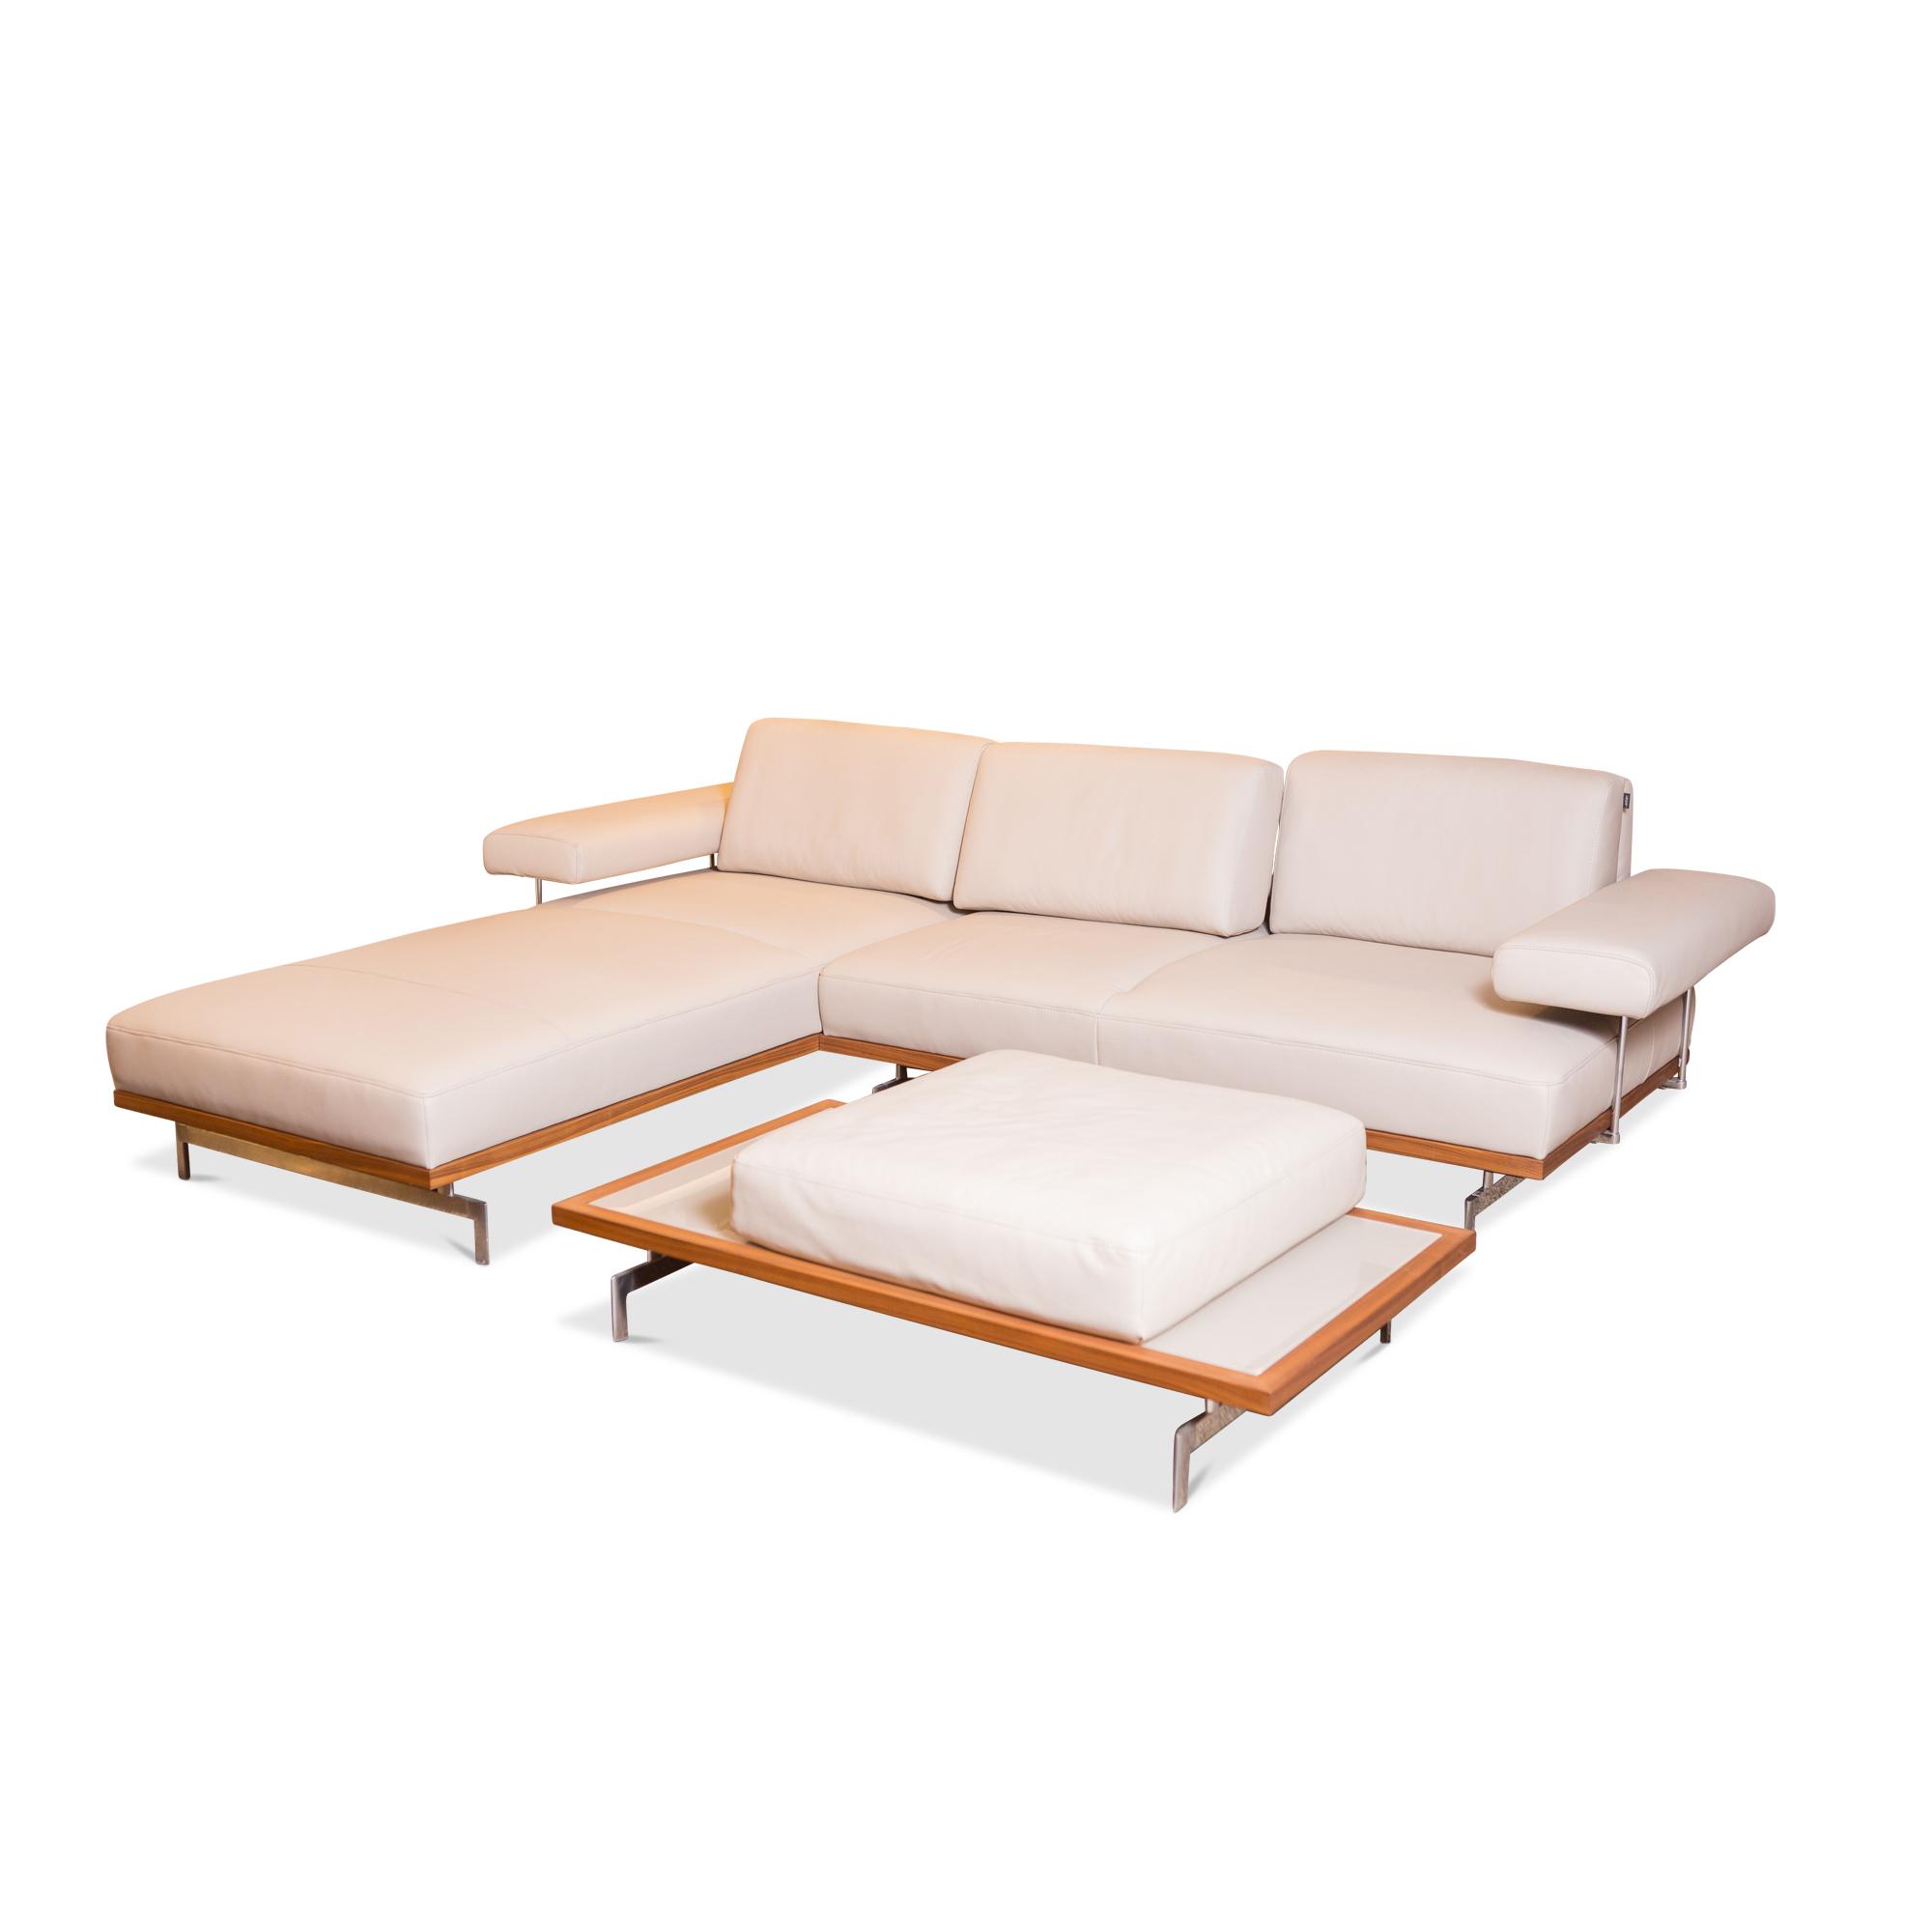 Ecksofa 8106 Joop (mit Hocker) – Himolla – Sofas – günstig kaufen ...